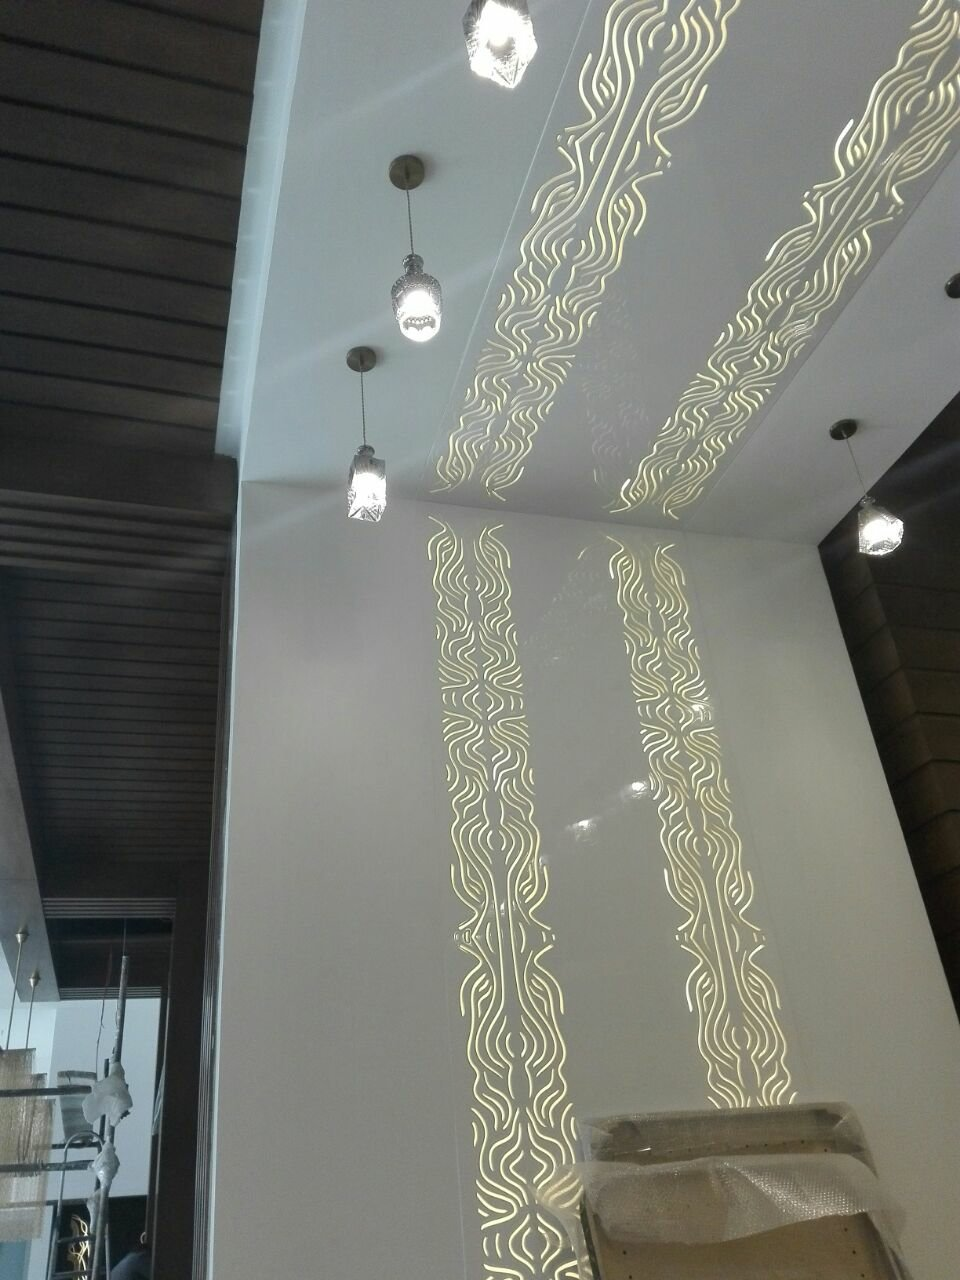 نورپردازی رستوران شاندیز تهران